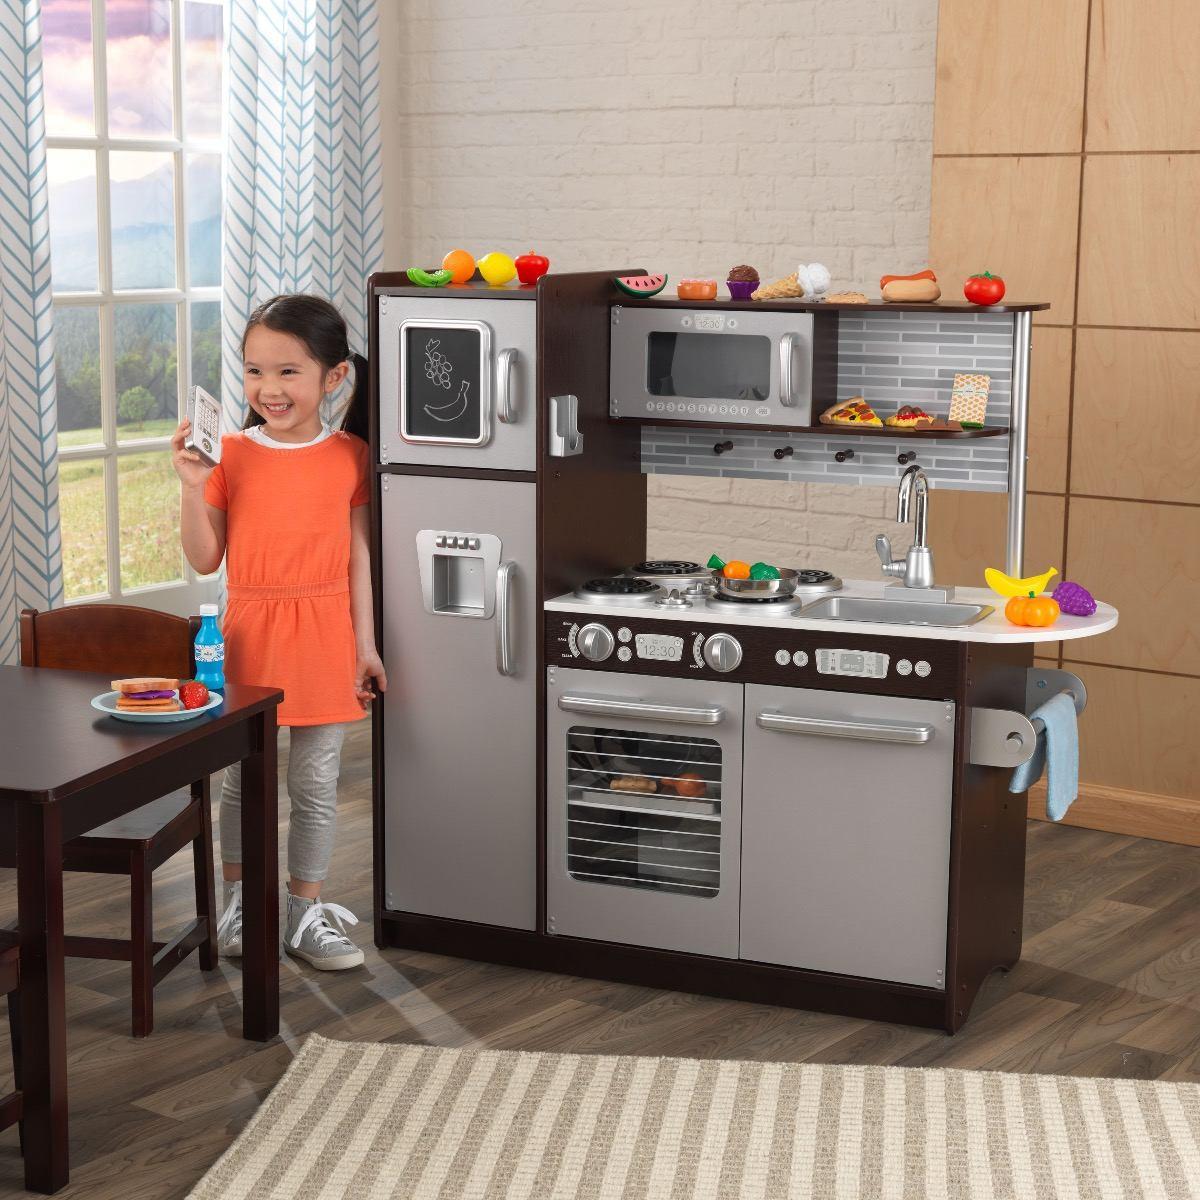 Xtreme Kidkraft Uptown 30 Cocina Juguete Para Niña Piezas lKJuTF1c35